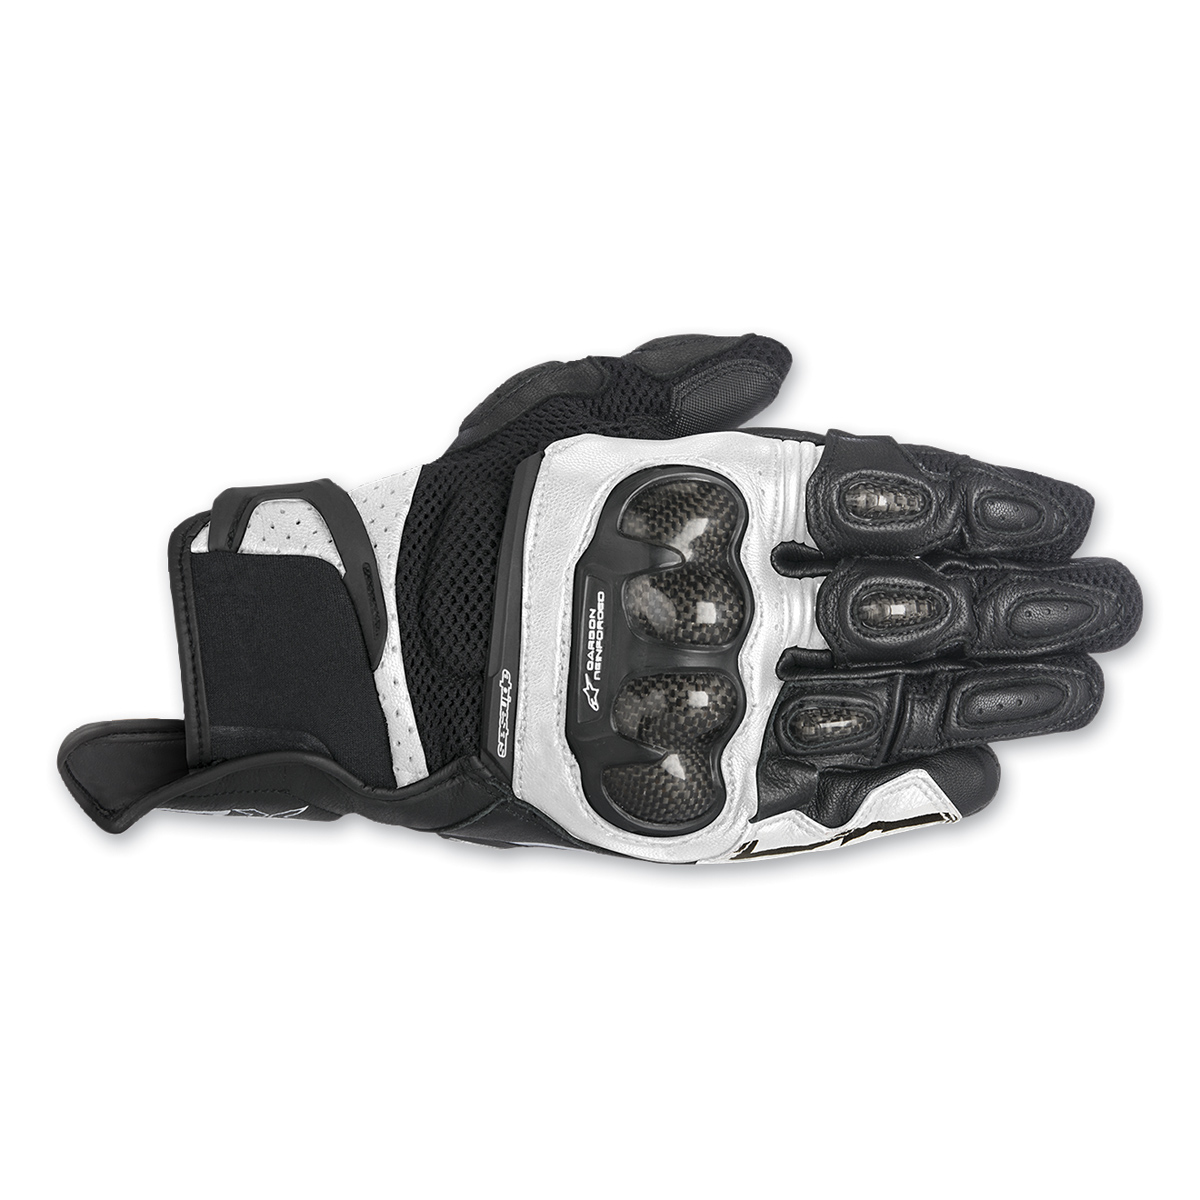 Alpinestars Men's SPX Air Carbon Black/White Glove